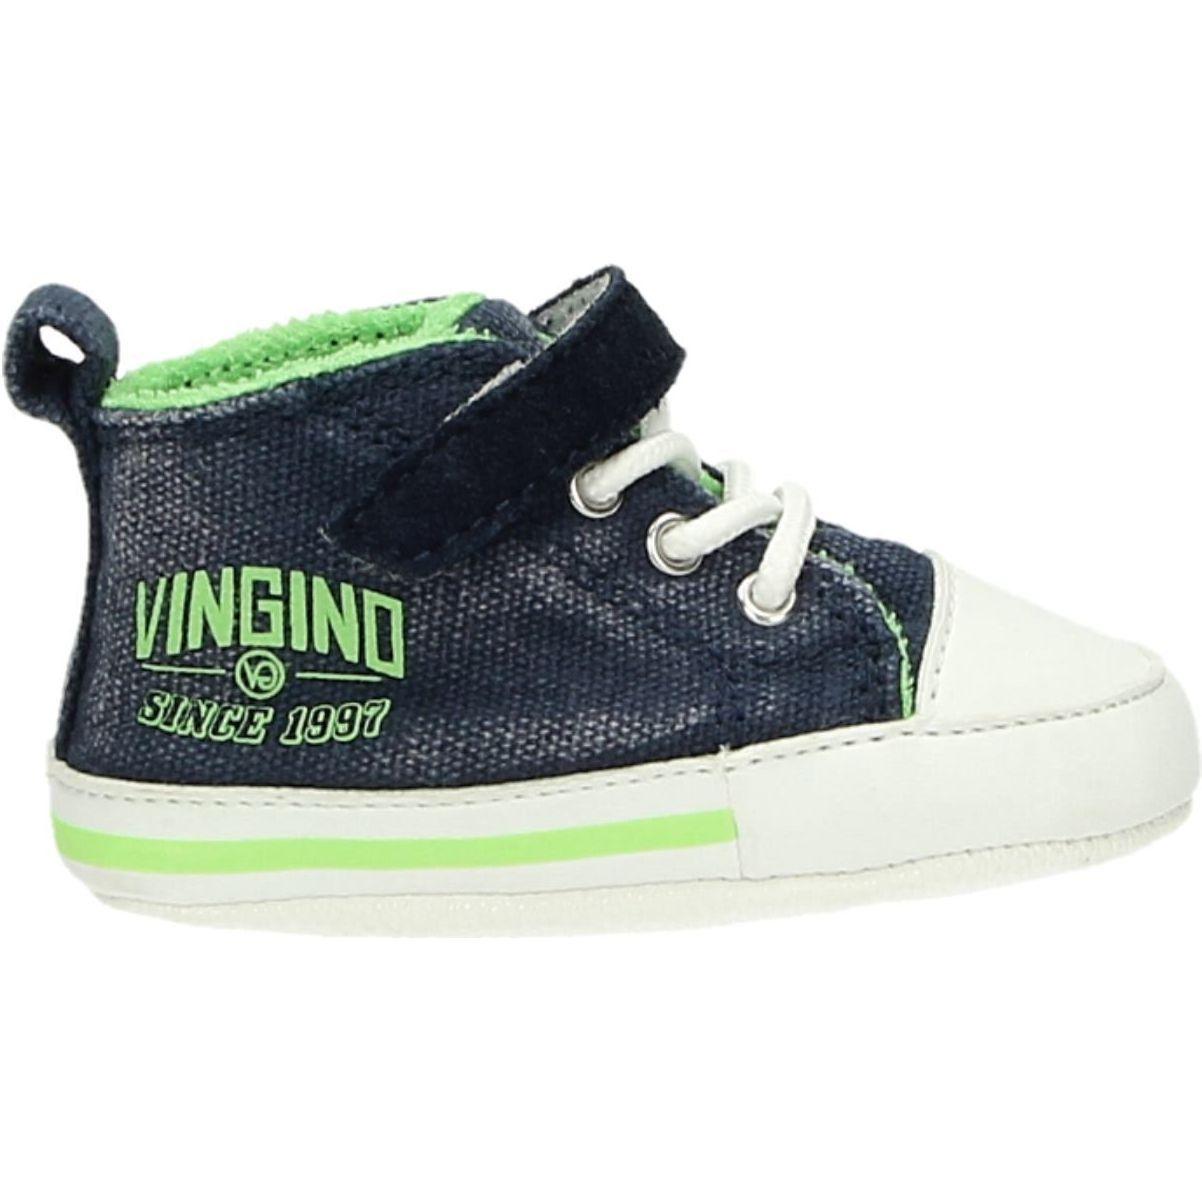 Vingino Babyschoenen Blauw Babyschoenen Blauw Vingino